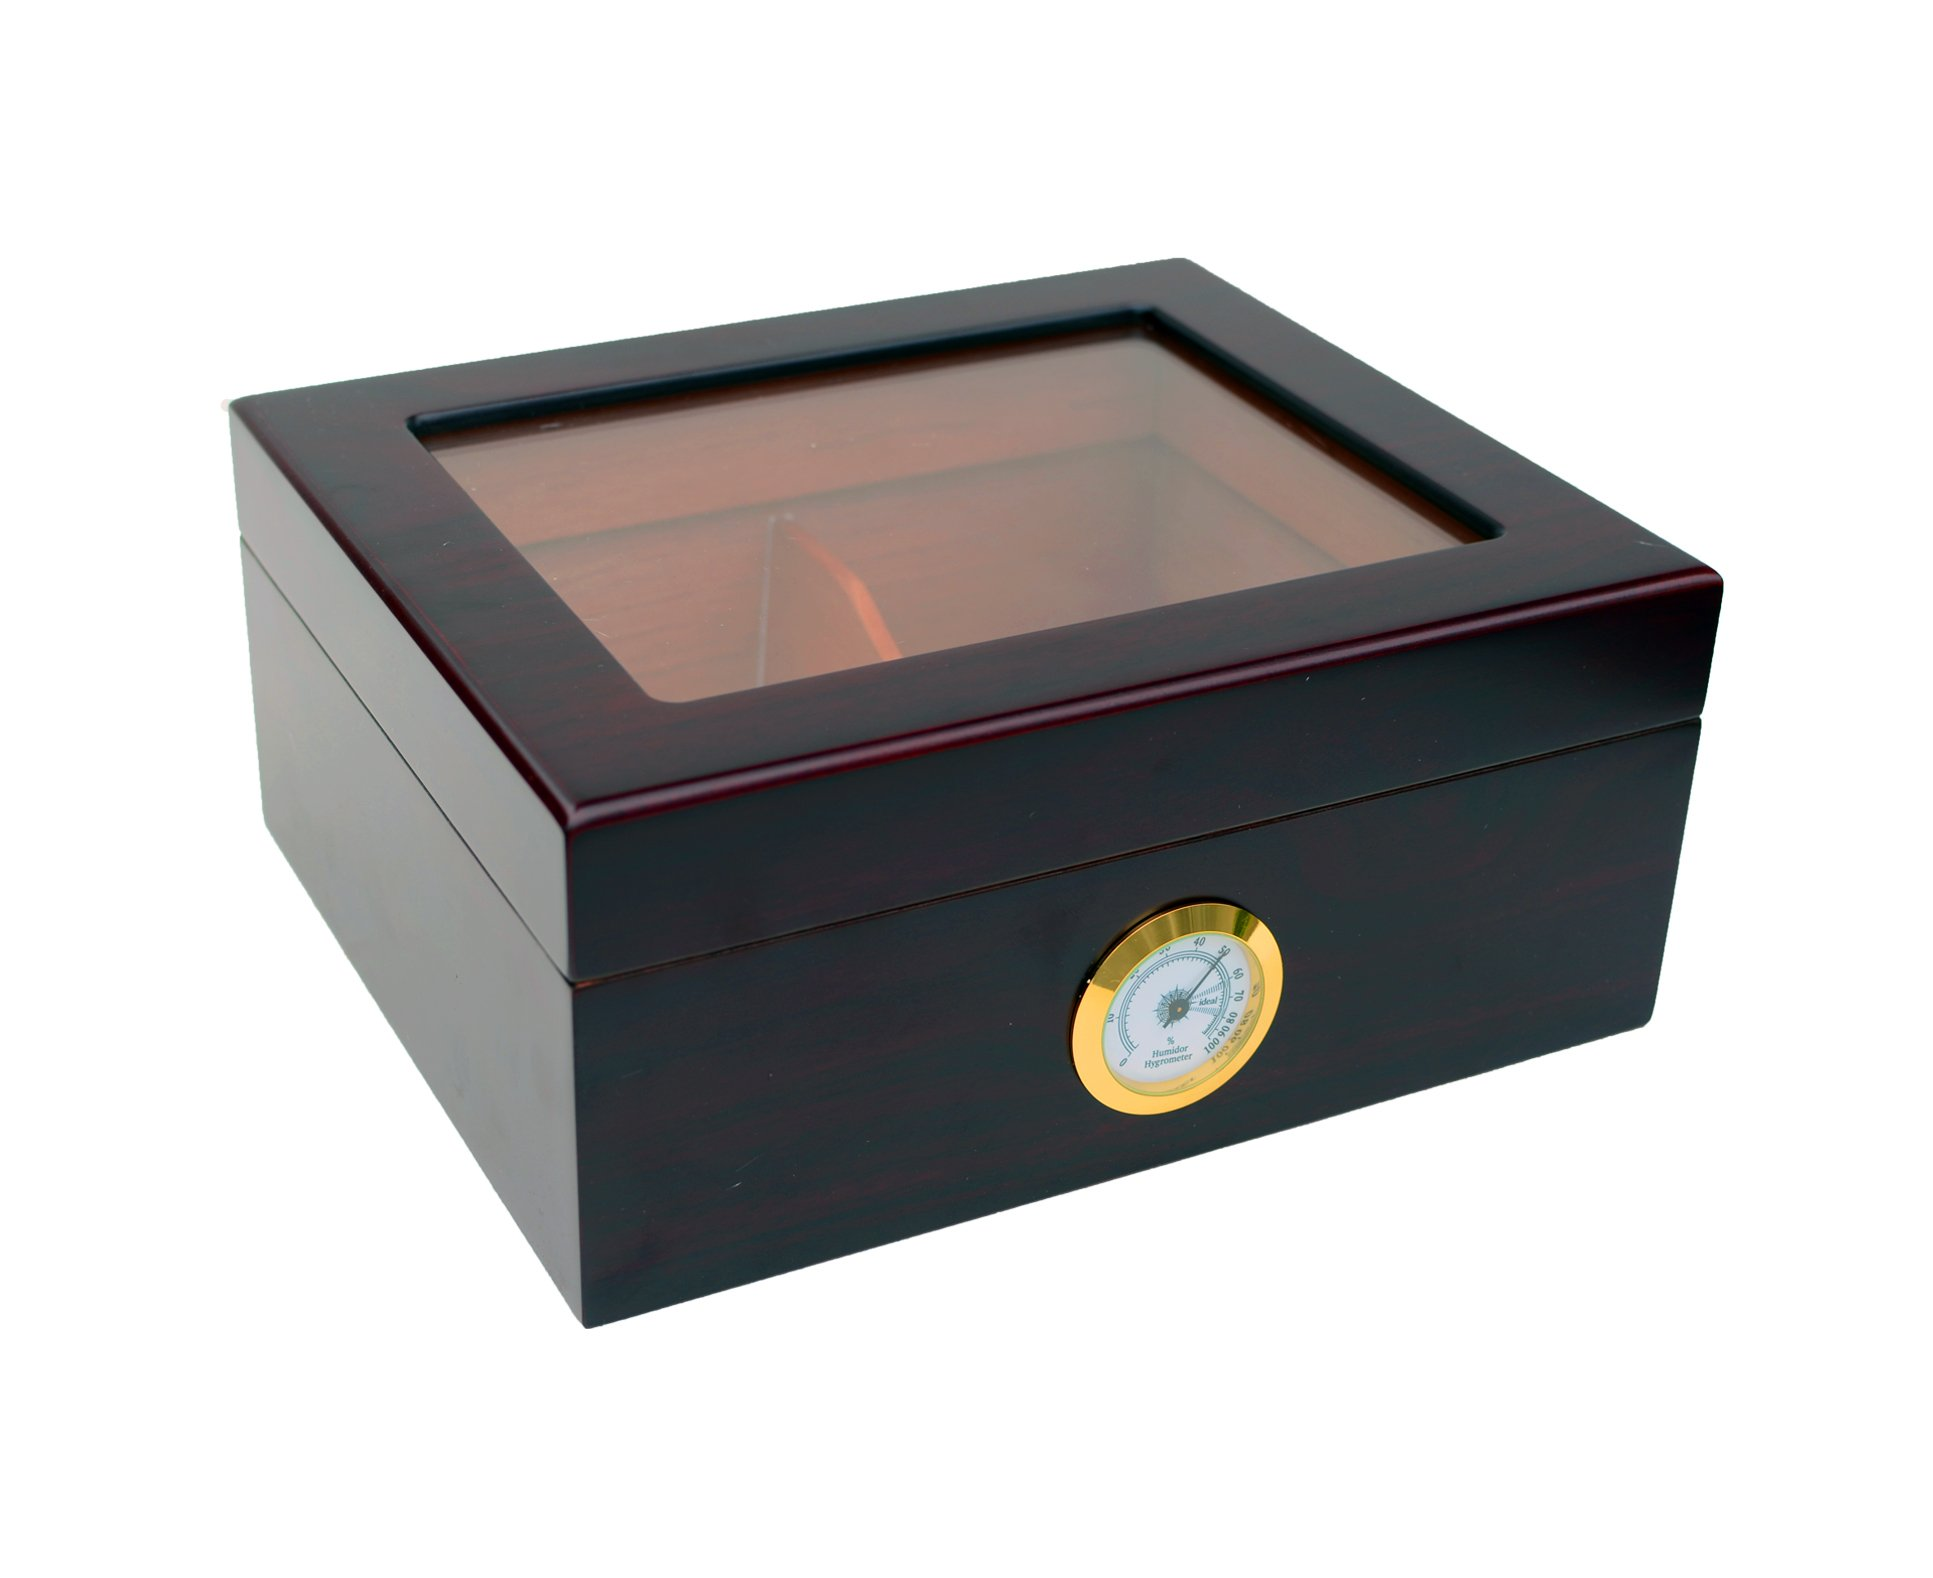 Maypes Desktop Humidor w/Hygrometer - Holds 25-50 Cigars - Cigar Aficionado Set Includes: Tempered Glass Top, Hygrometer, Dehumidifier, Divider - Interior: Spanish Cedar - Exterior: Mahogany Finish